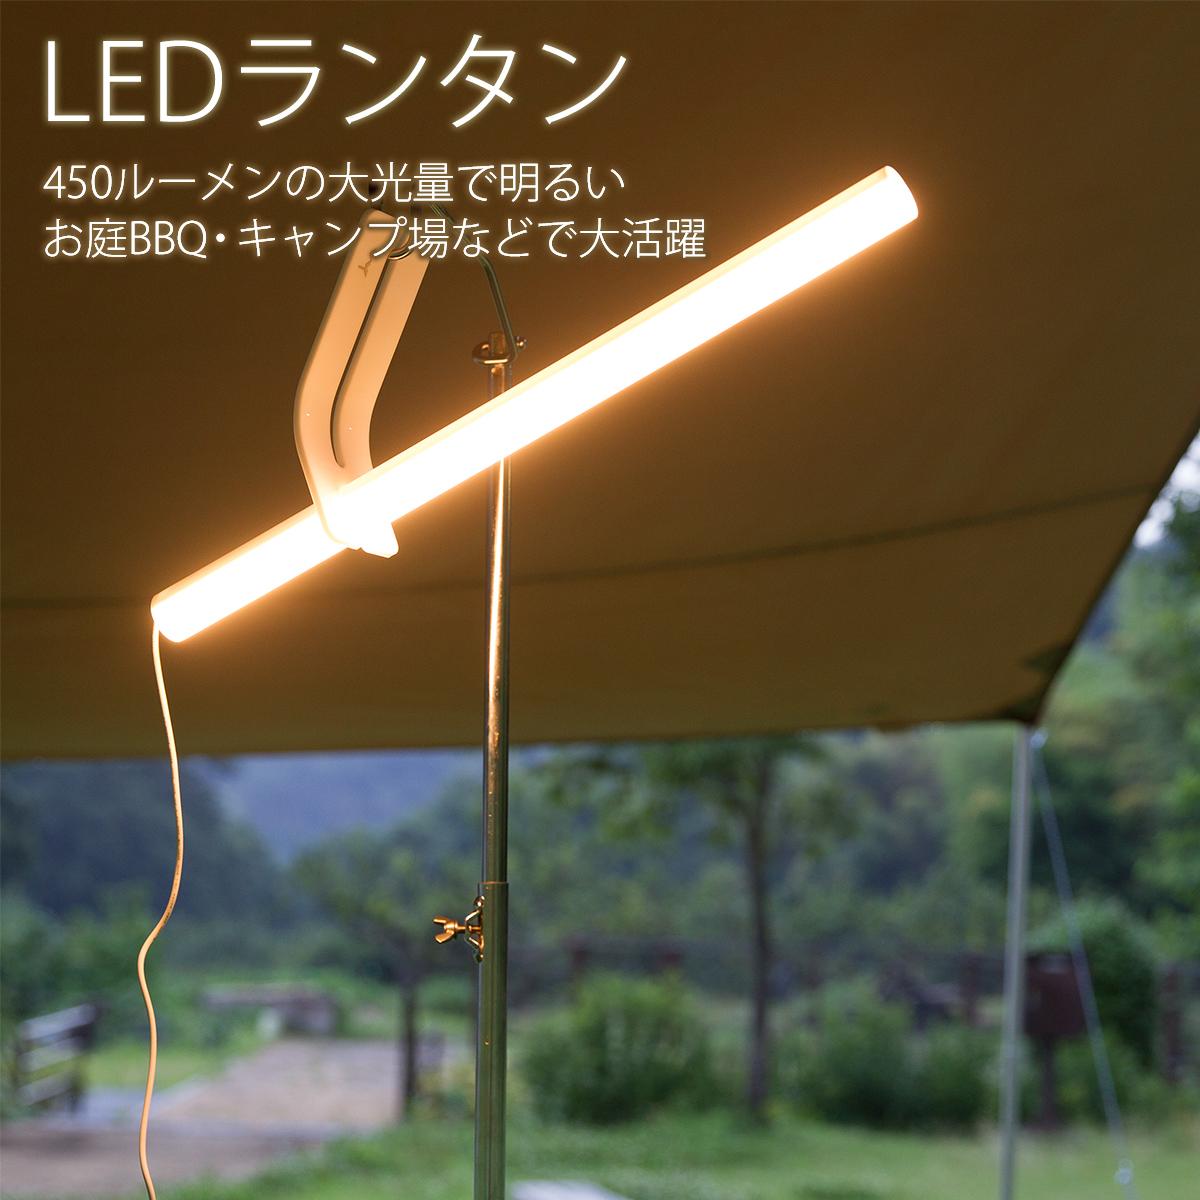 Wy Style Rakuten Ichiba Store Wy Led Lantern Pole Light Usb Feeding